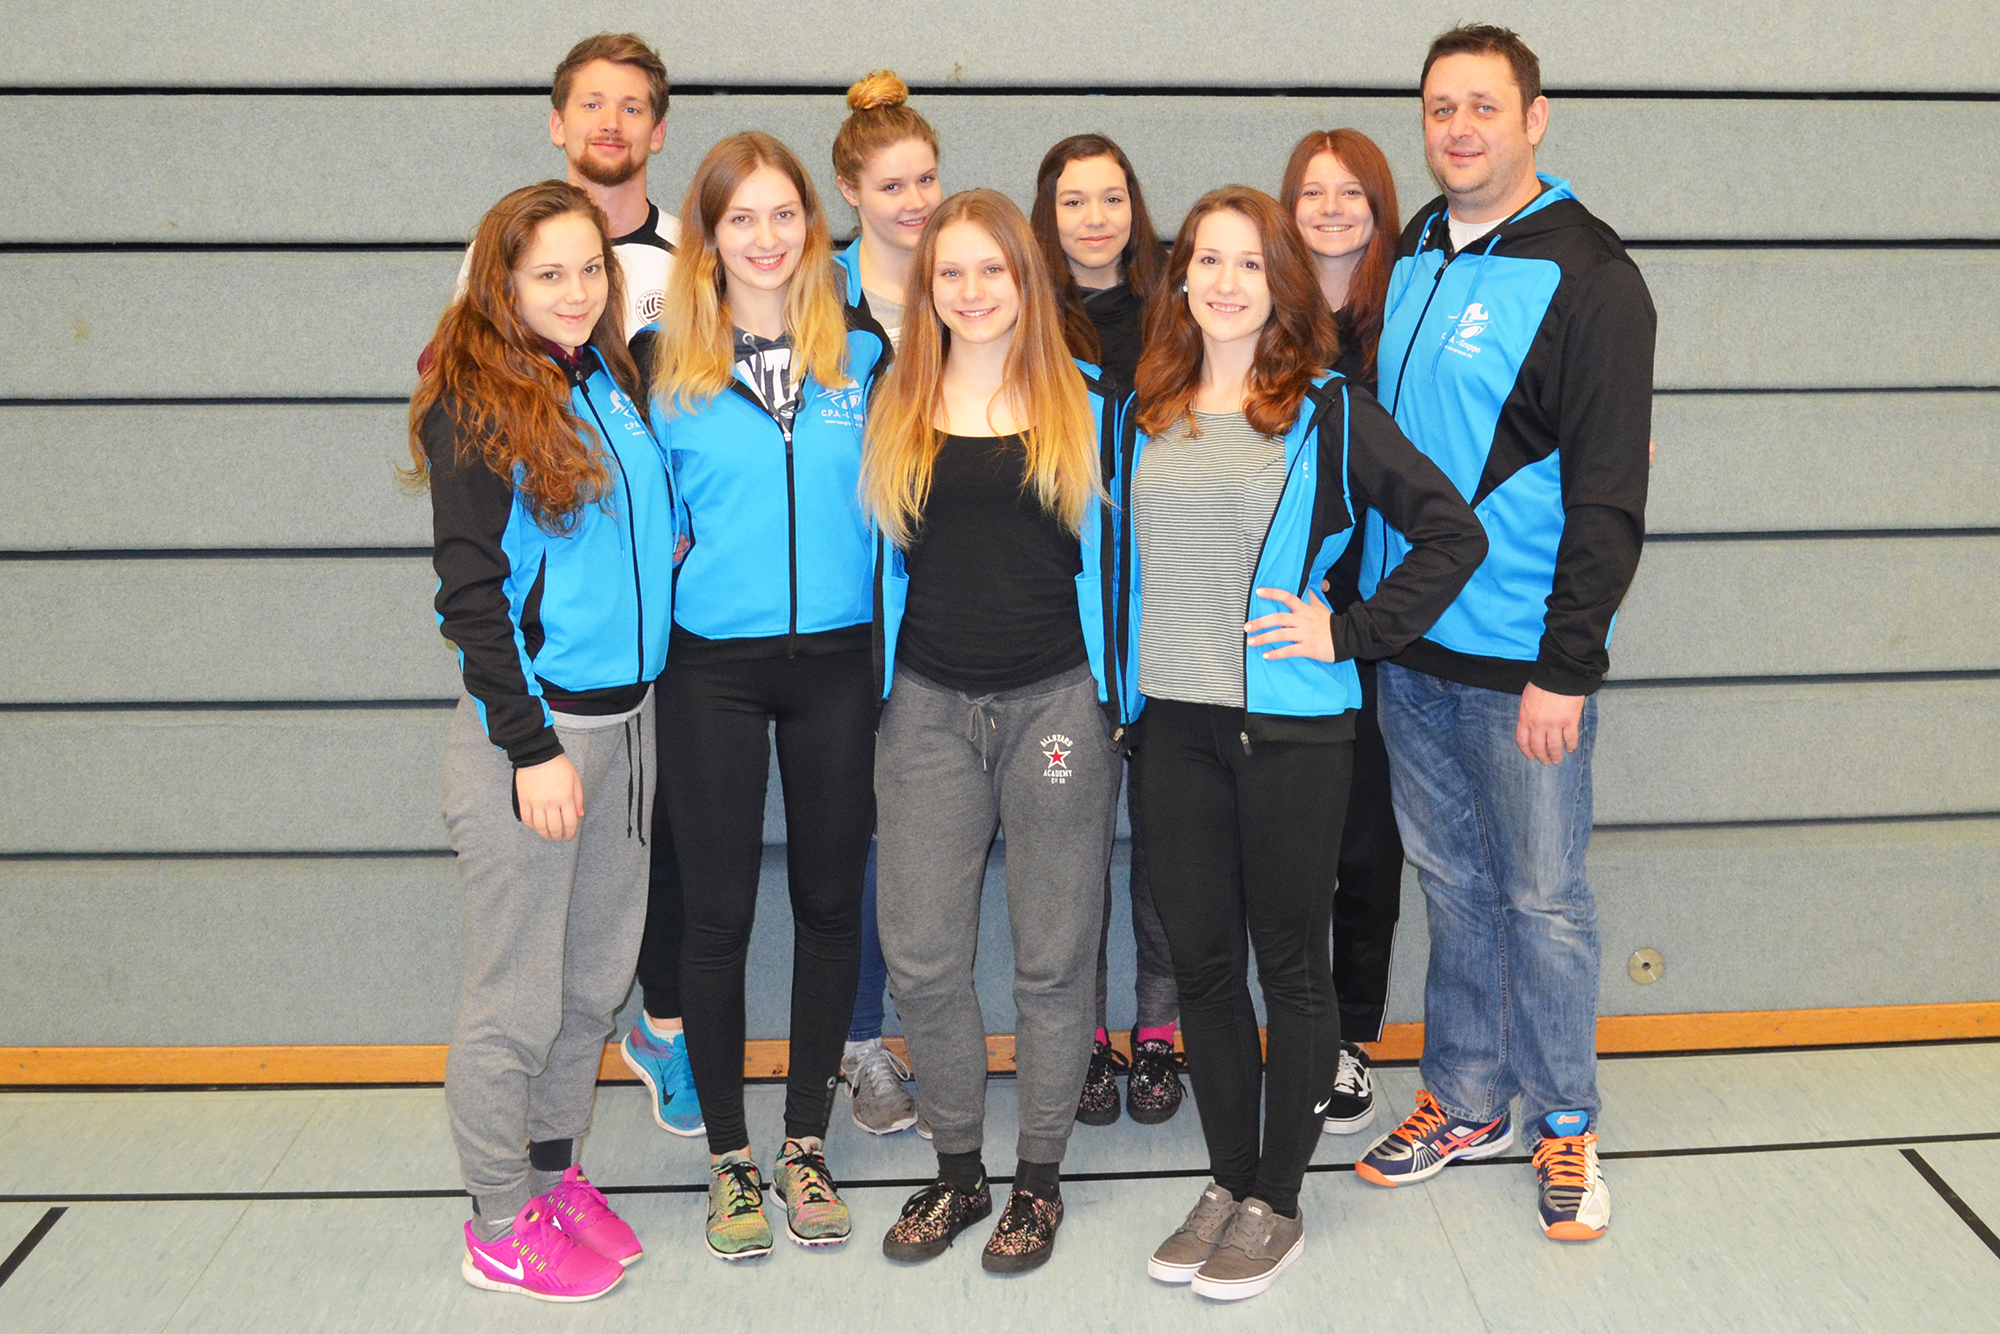 N.H. Young Volleys - Jugend U20